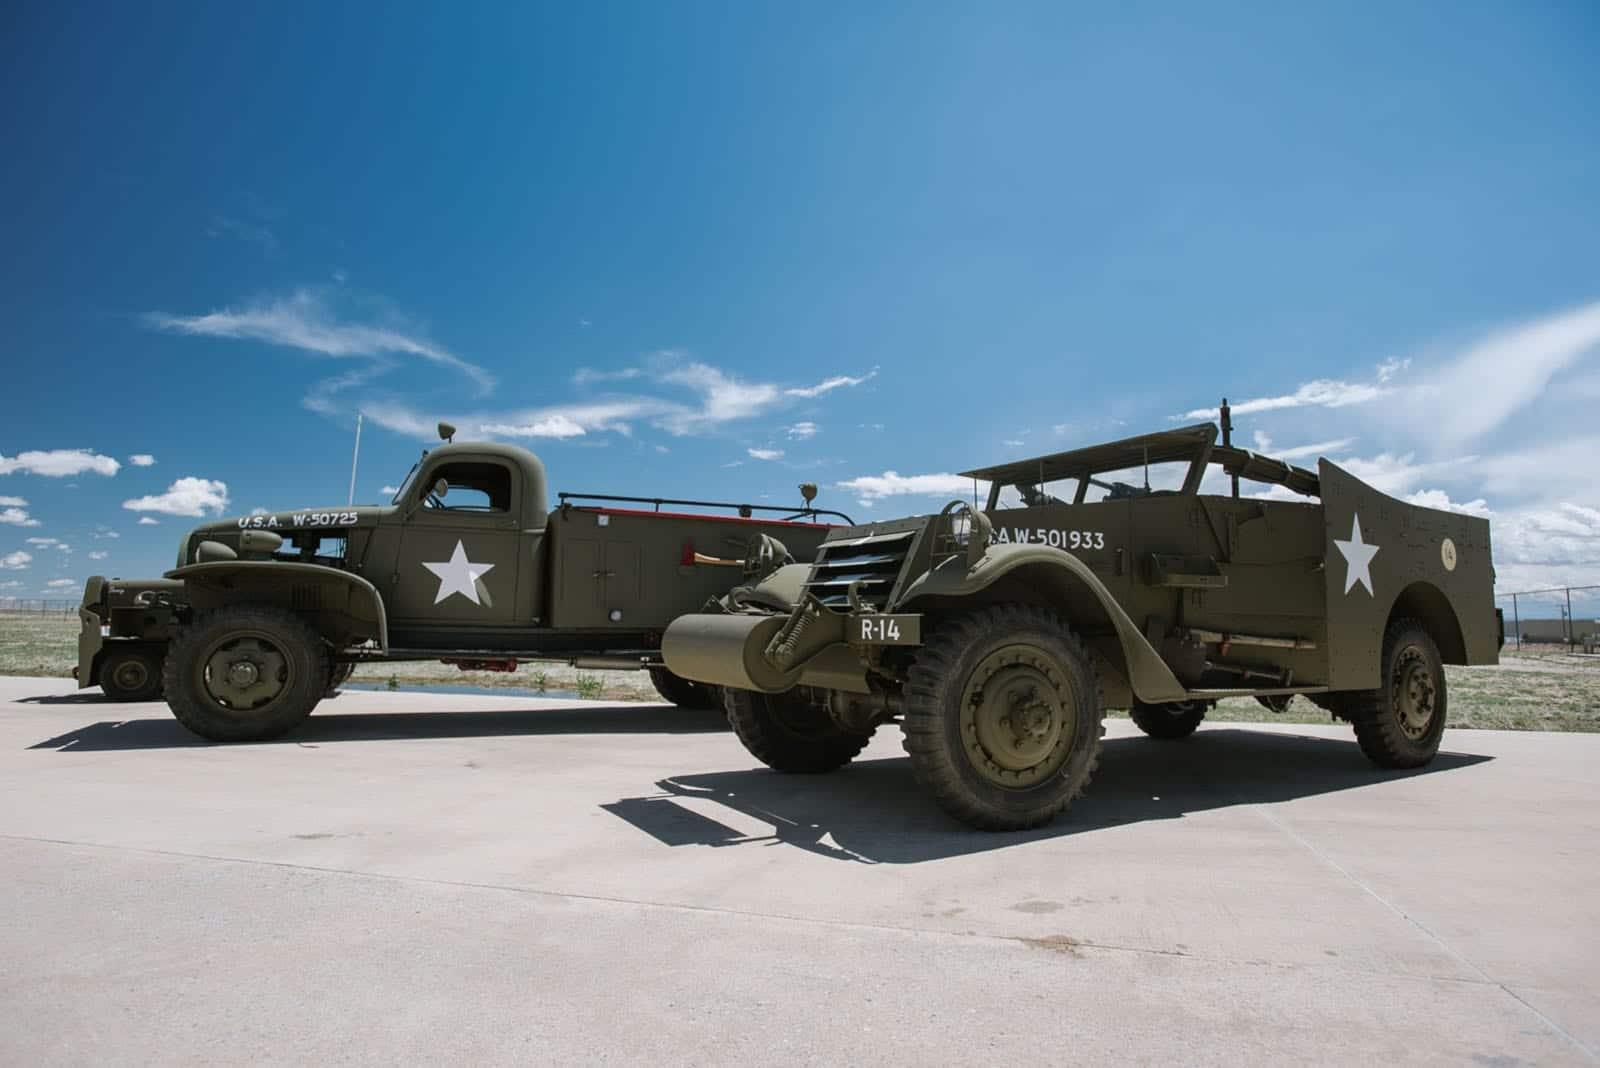 WarBird Auto Classic Watkins CO Military Show Cars